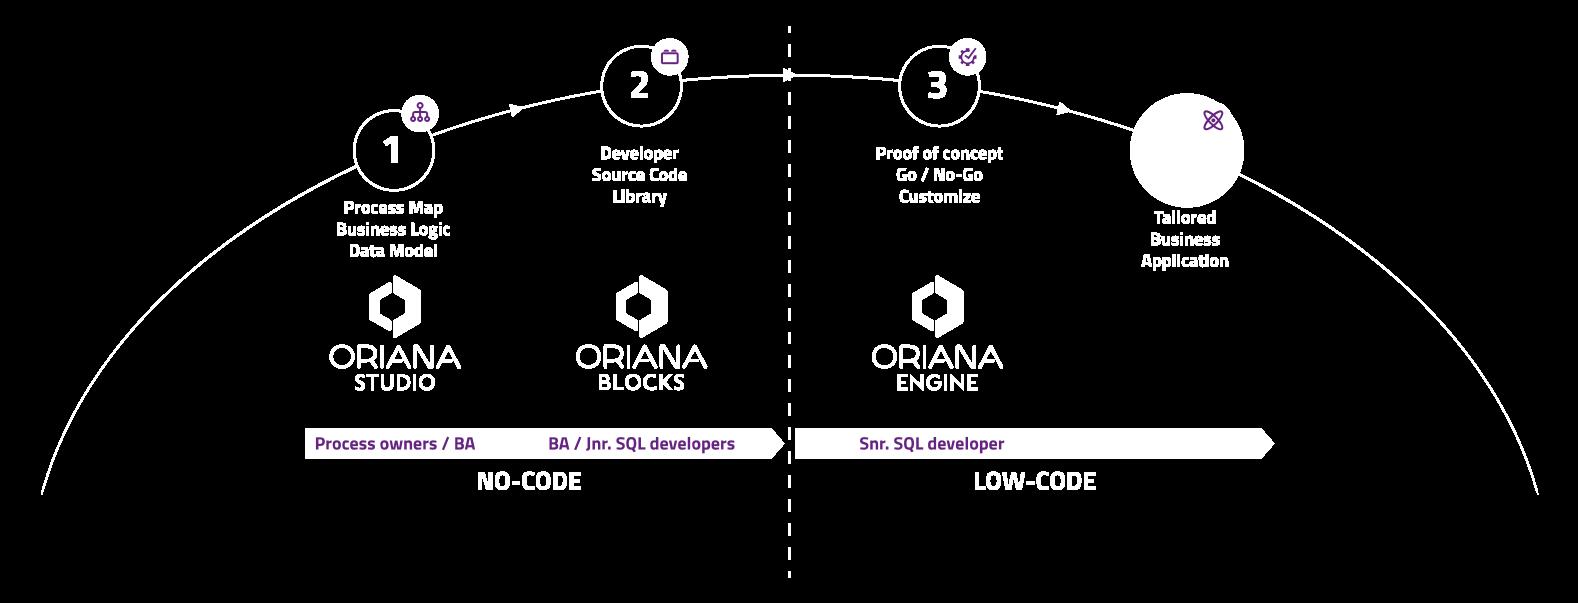 oriana low code platform